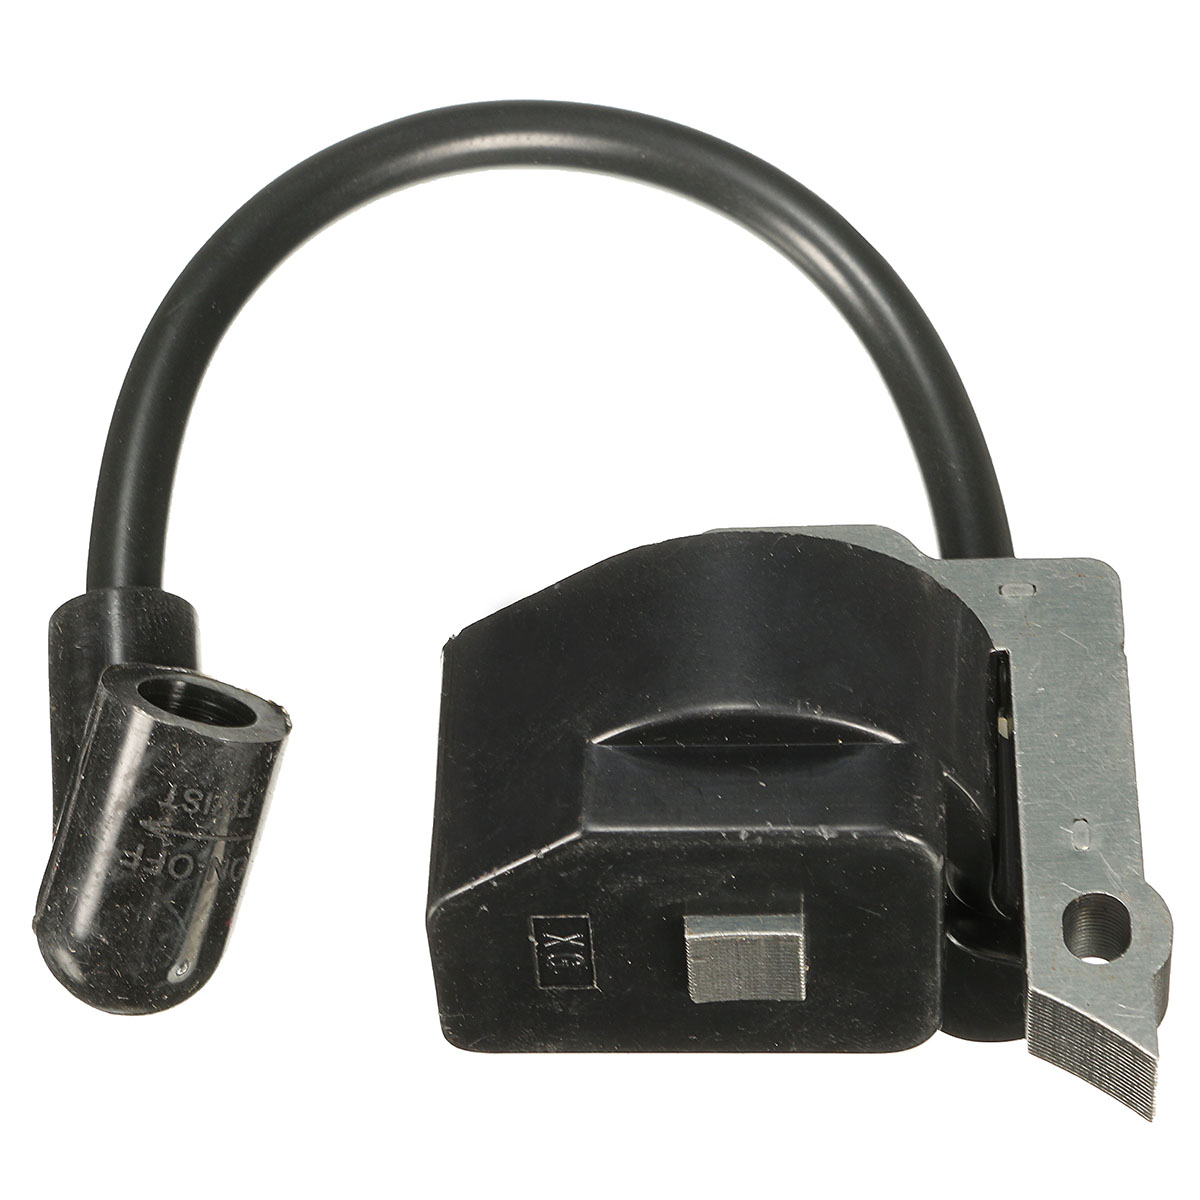 Ignition Coil For Homelite XL XL2 Super 2 VI Super 2 Chainsaws 94711